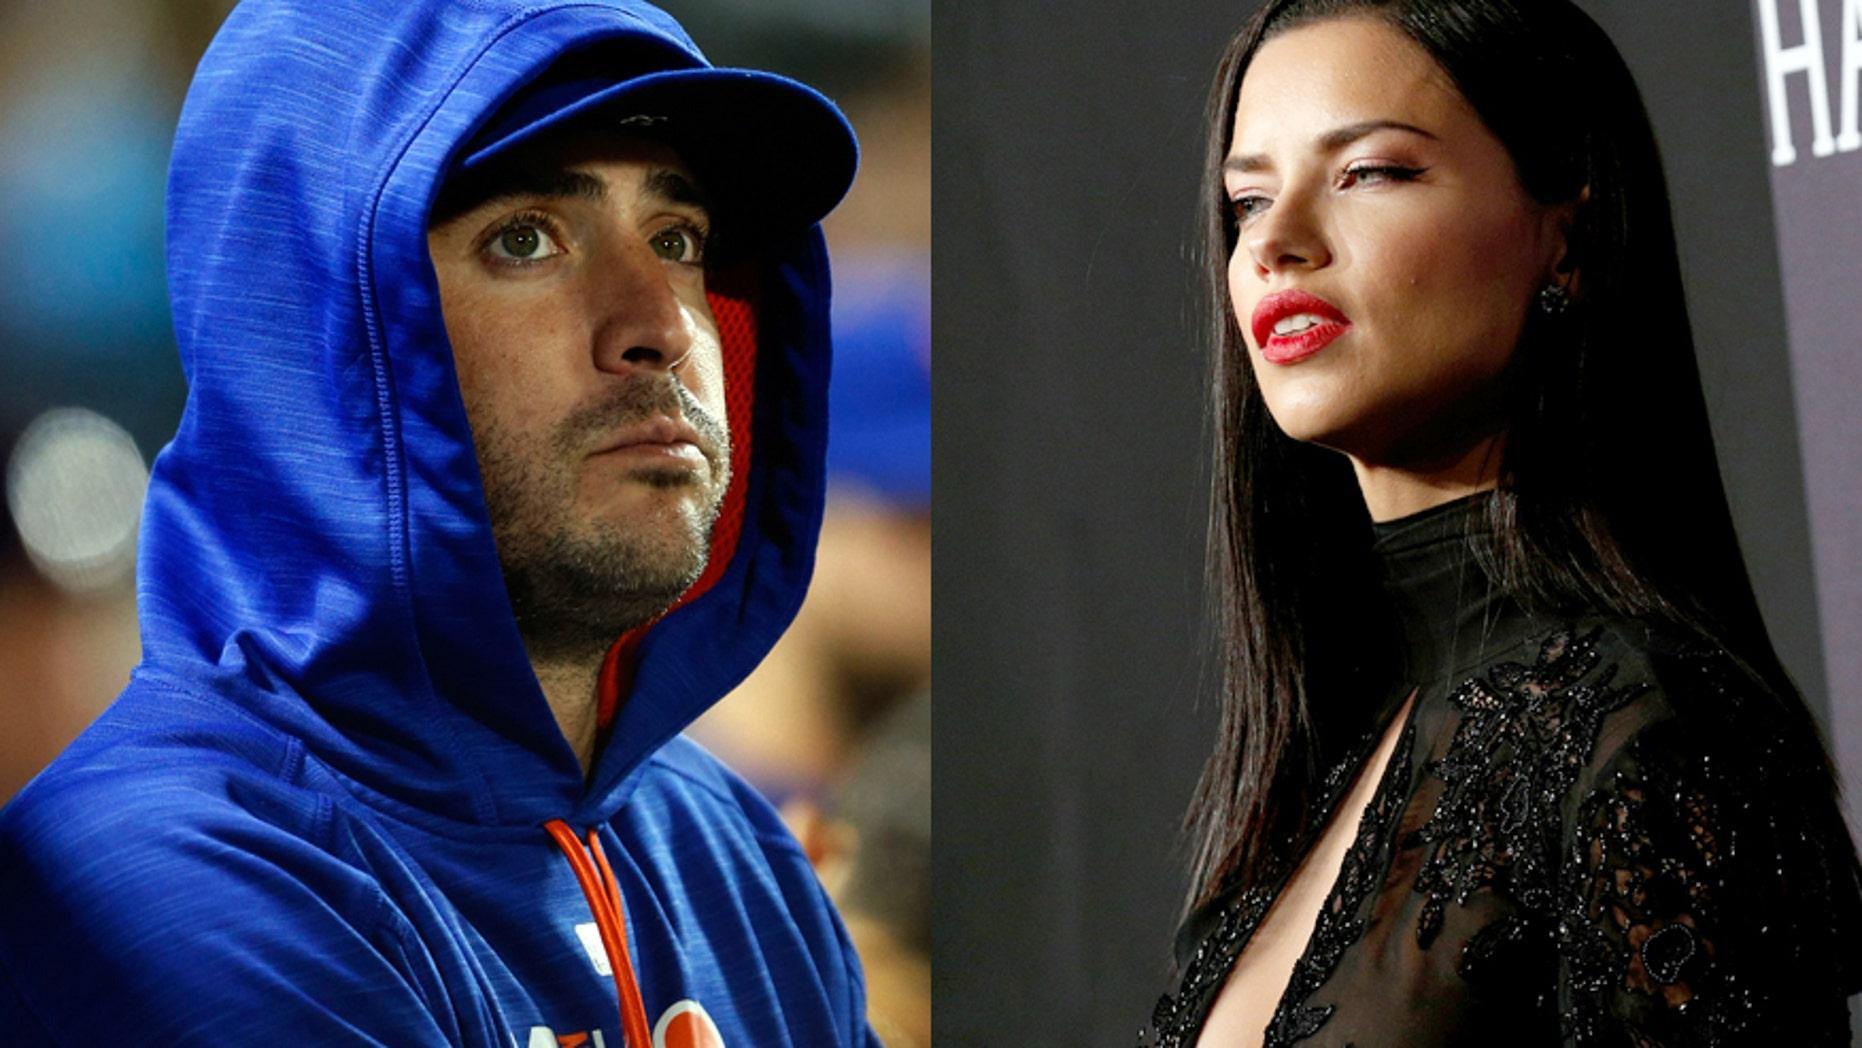 Mets player Matt Harvey (left) and model Adriana Lima.